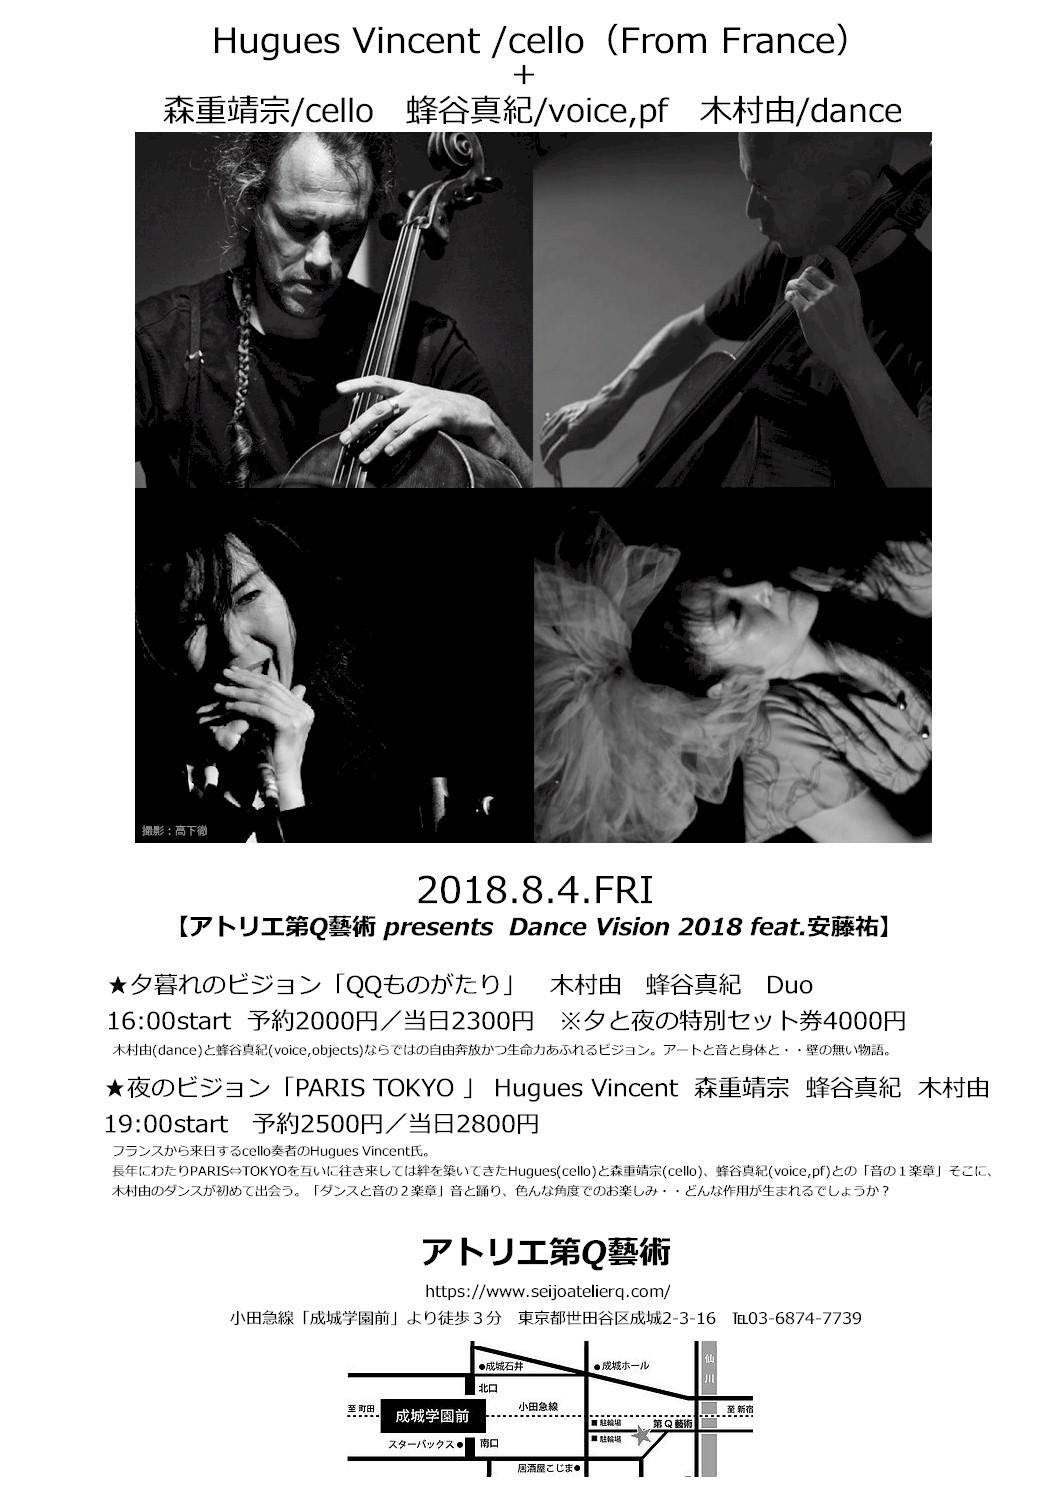 8/4&8/12【PARIS,TOKYO】2days!_d0244370_17075473.jpg